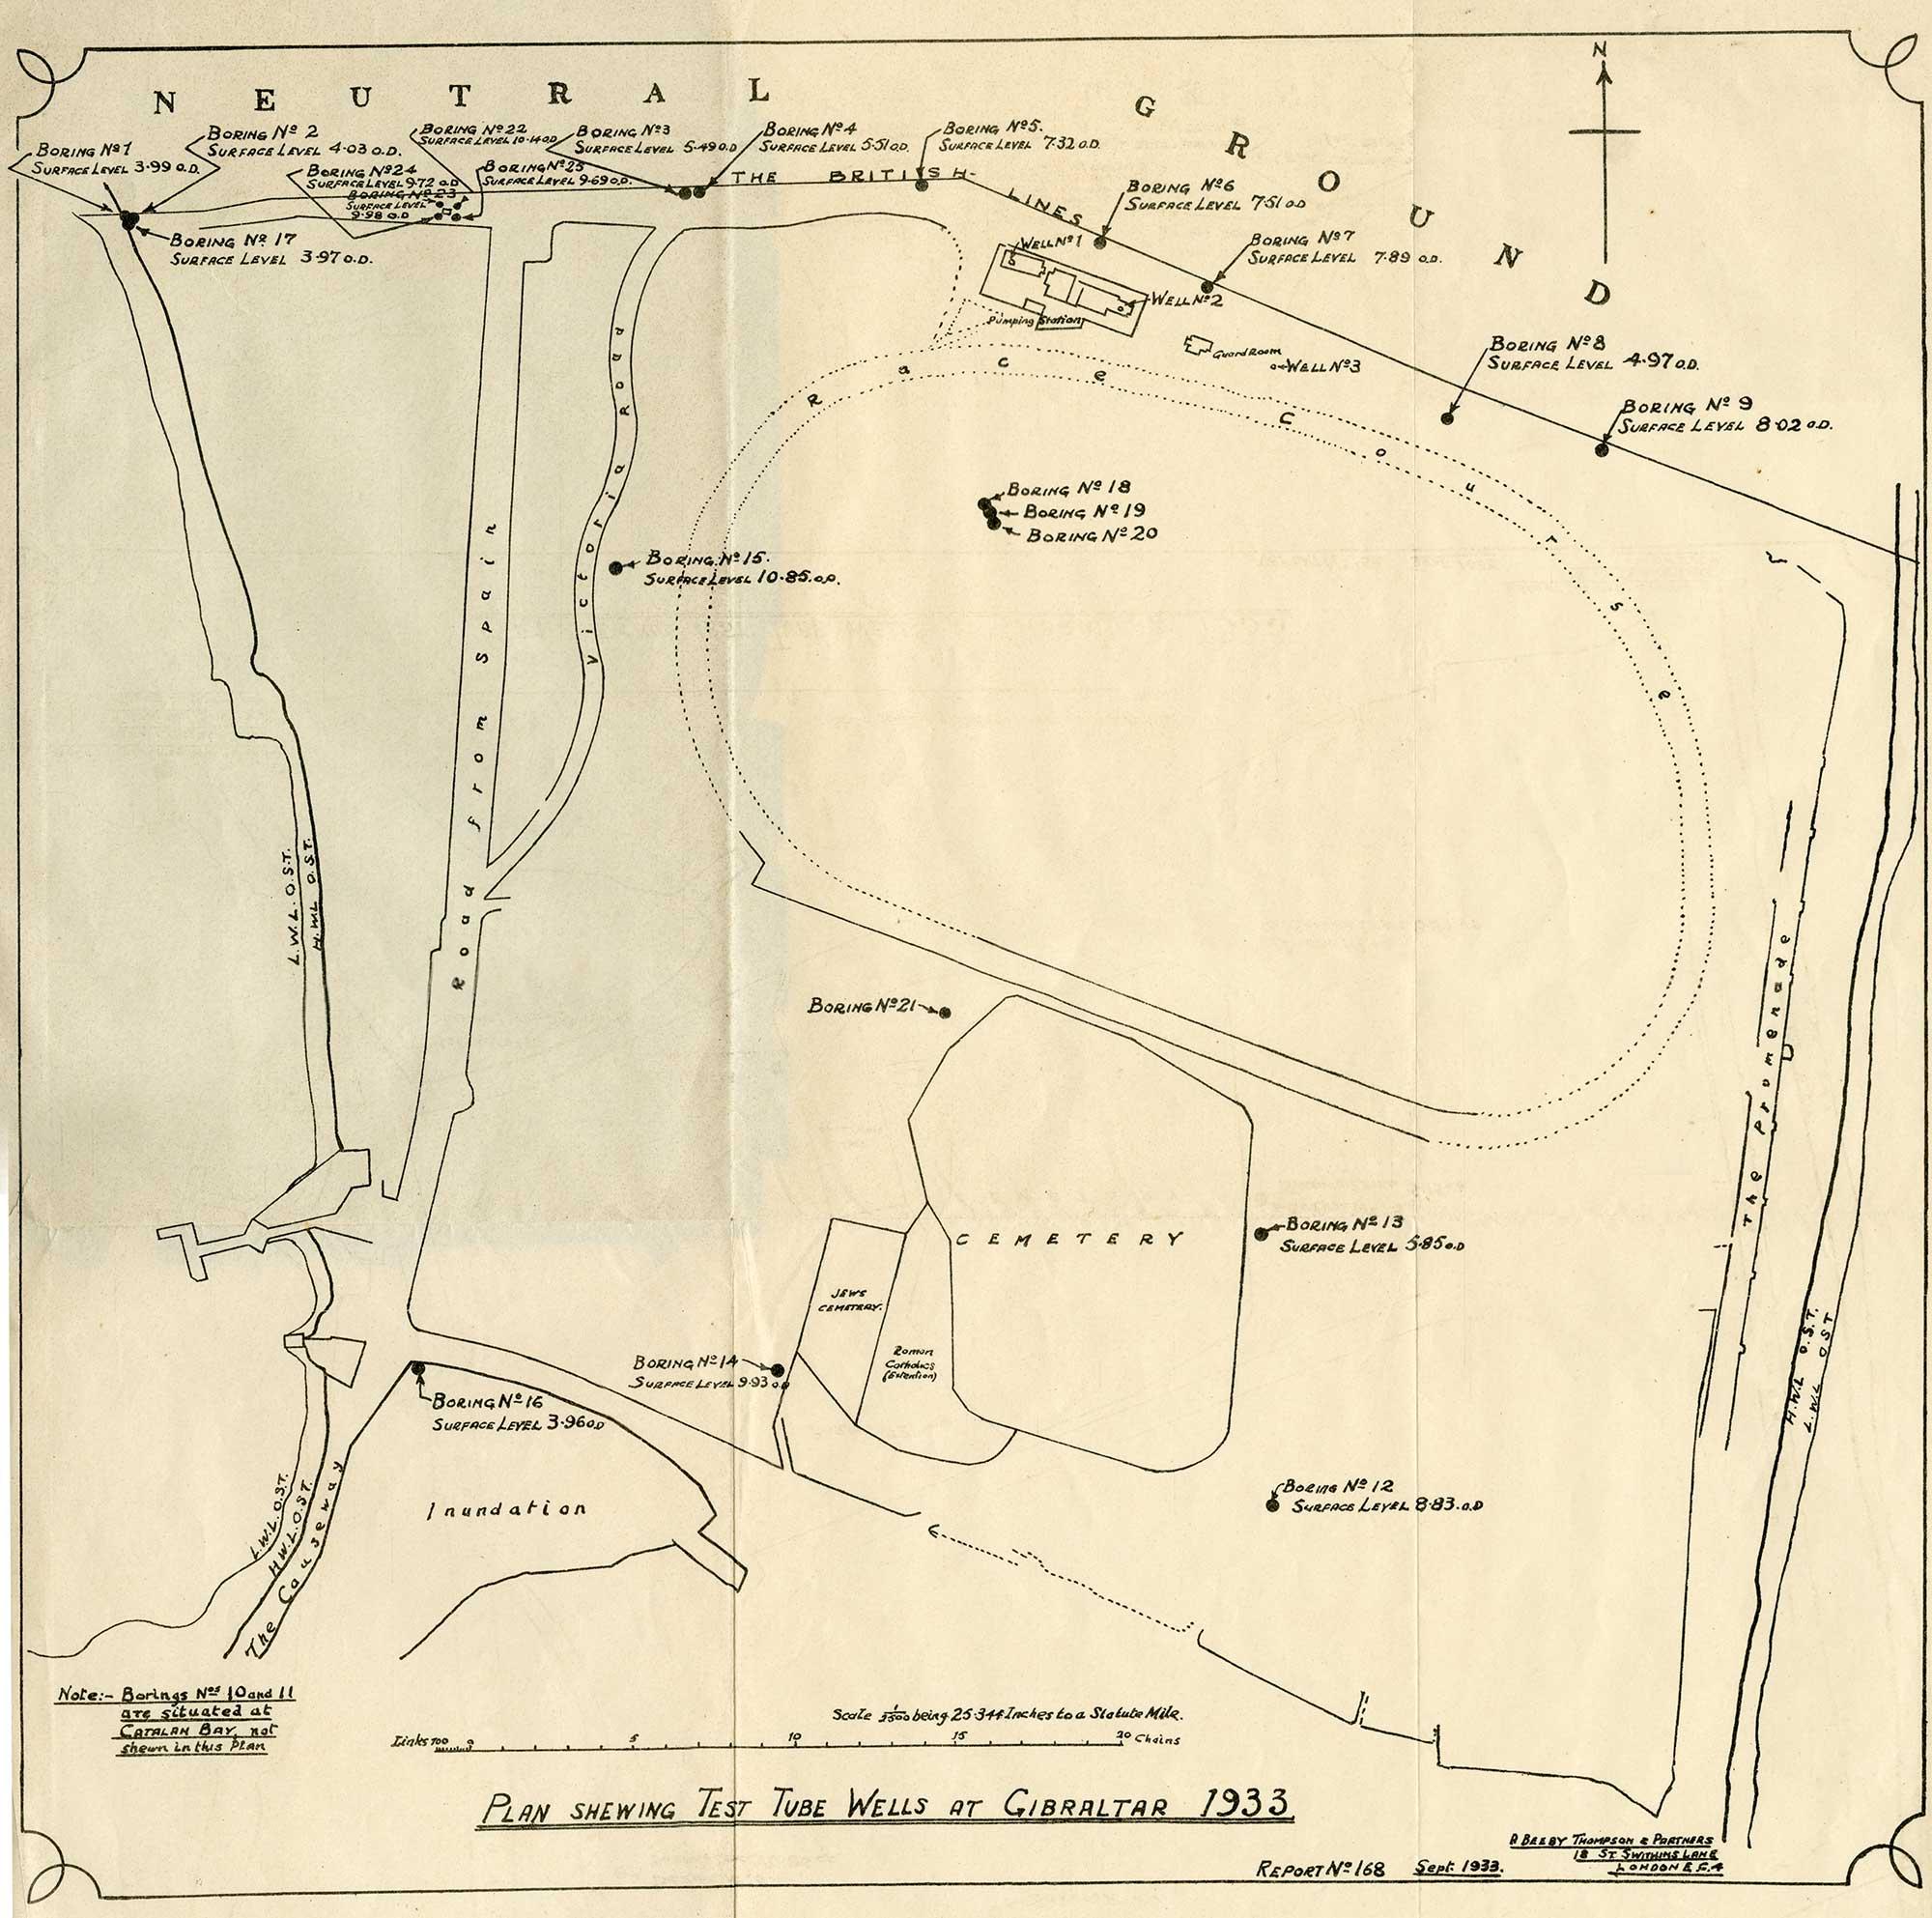 Map-47-test-tube-boring-holes-from-border-to-laguana-estate-